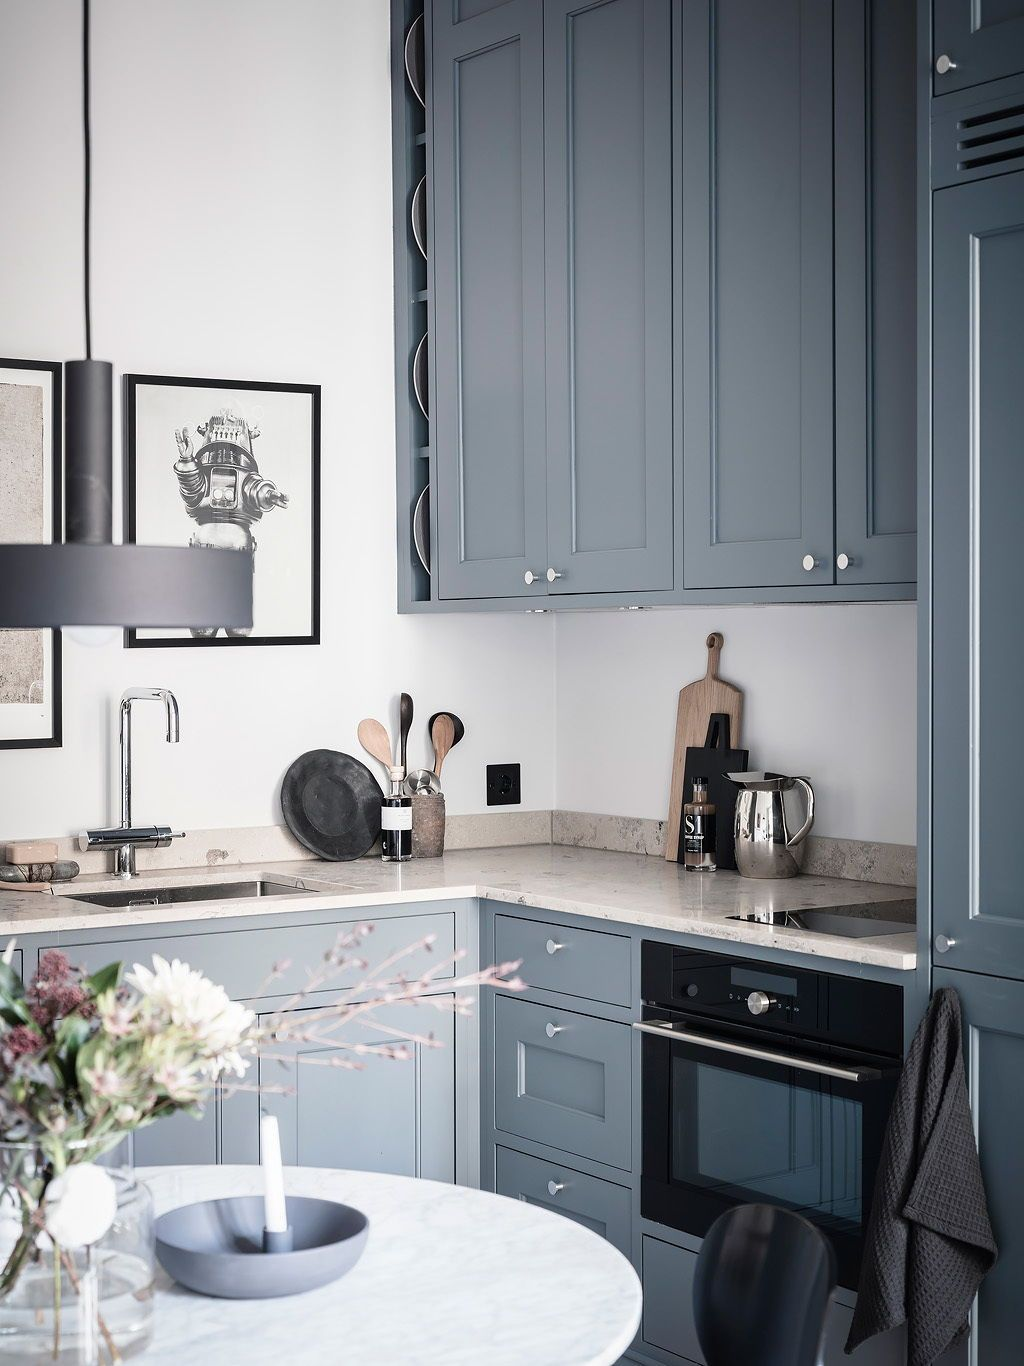 Small but stylish studio apartment - COCO LAPINE DESIGN ...